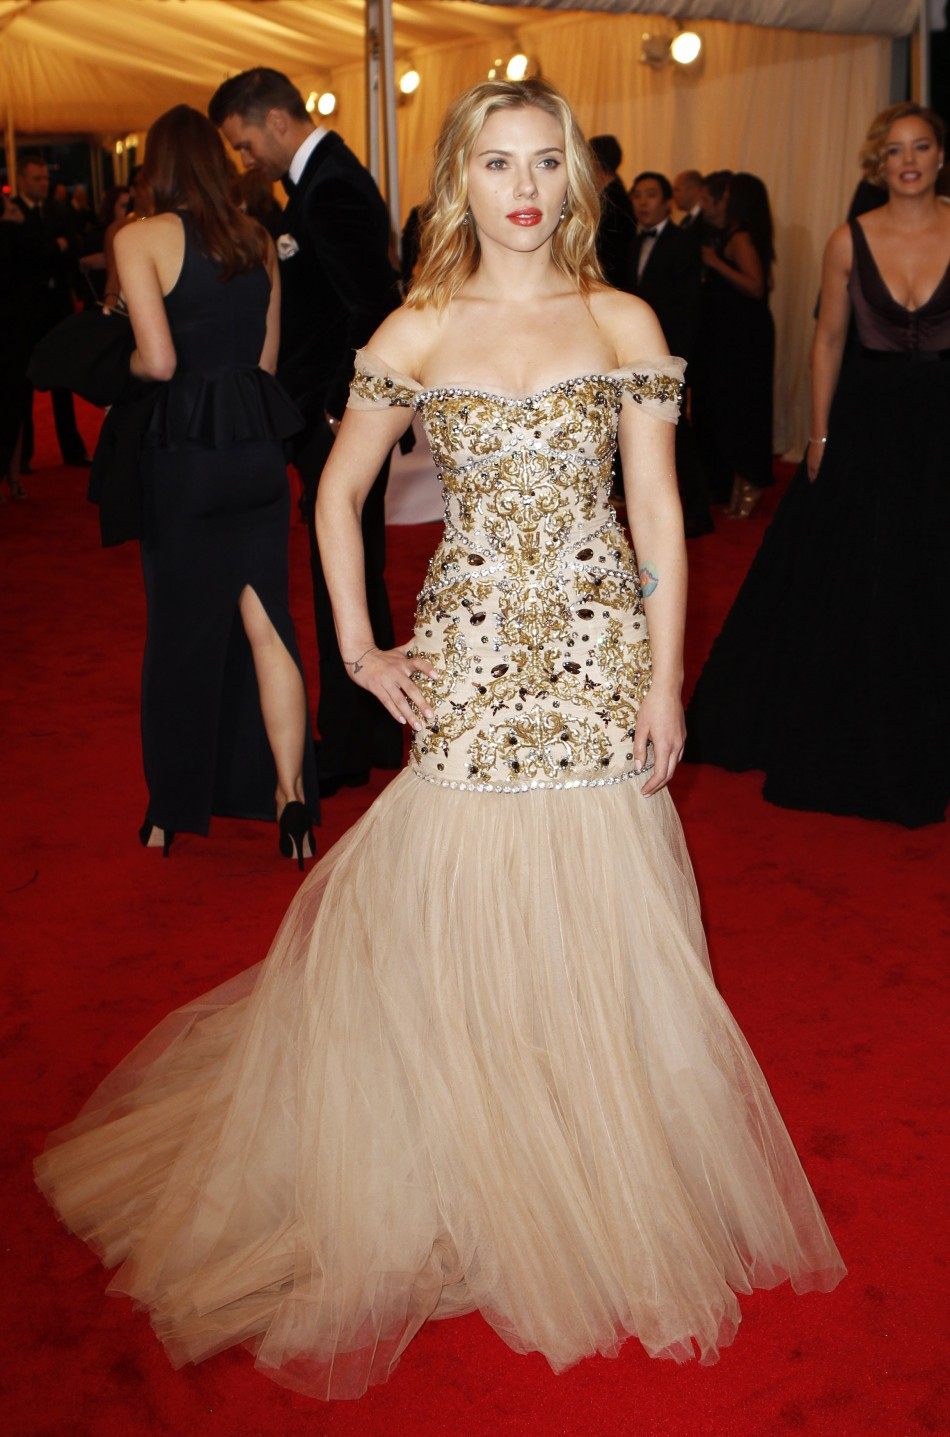 Scarlett Johansson - 2012 Met Gala